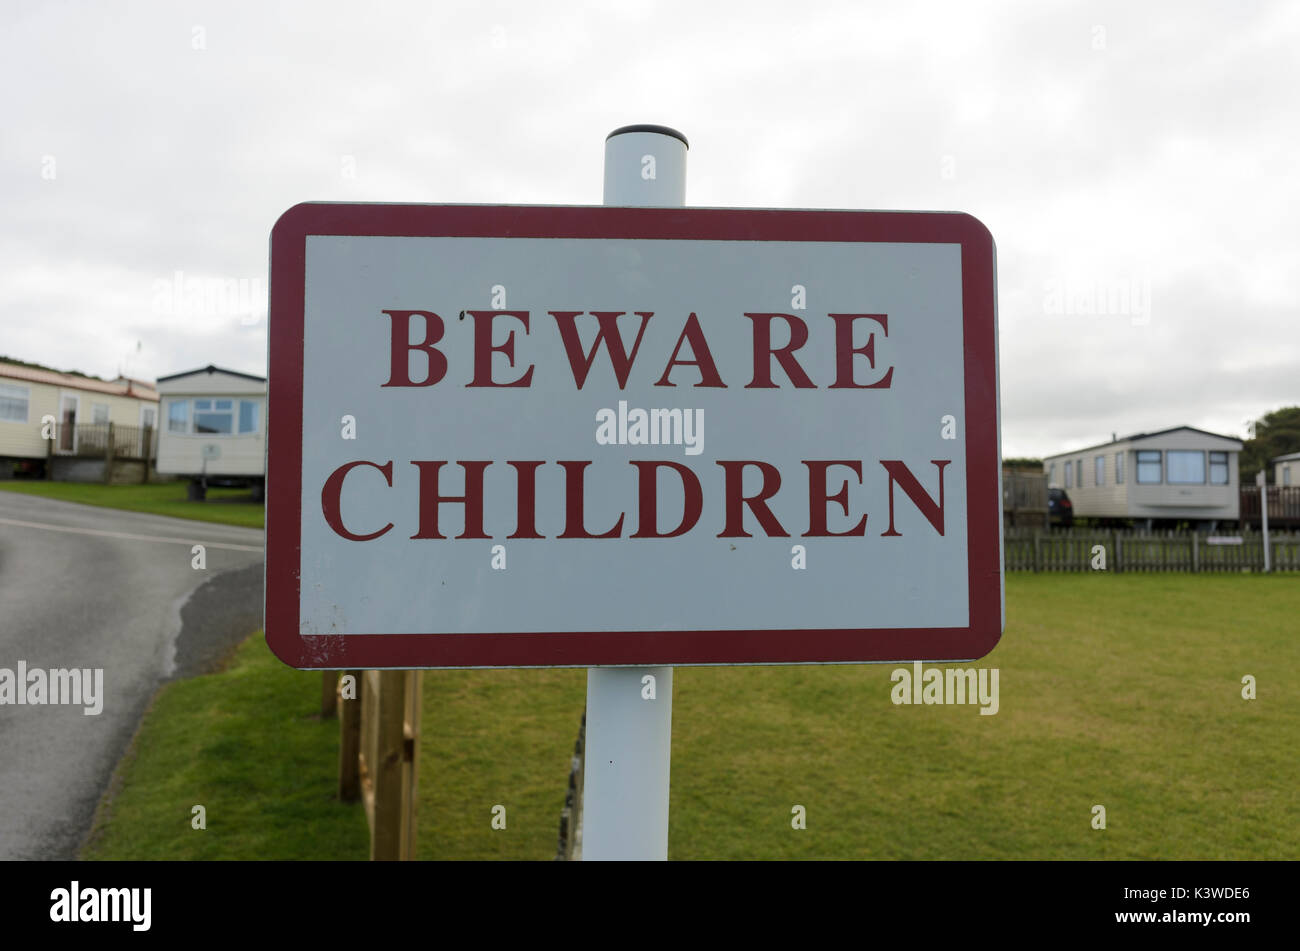 Beware Children sign - Stock Image